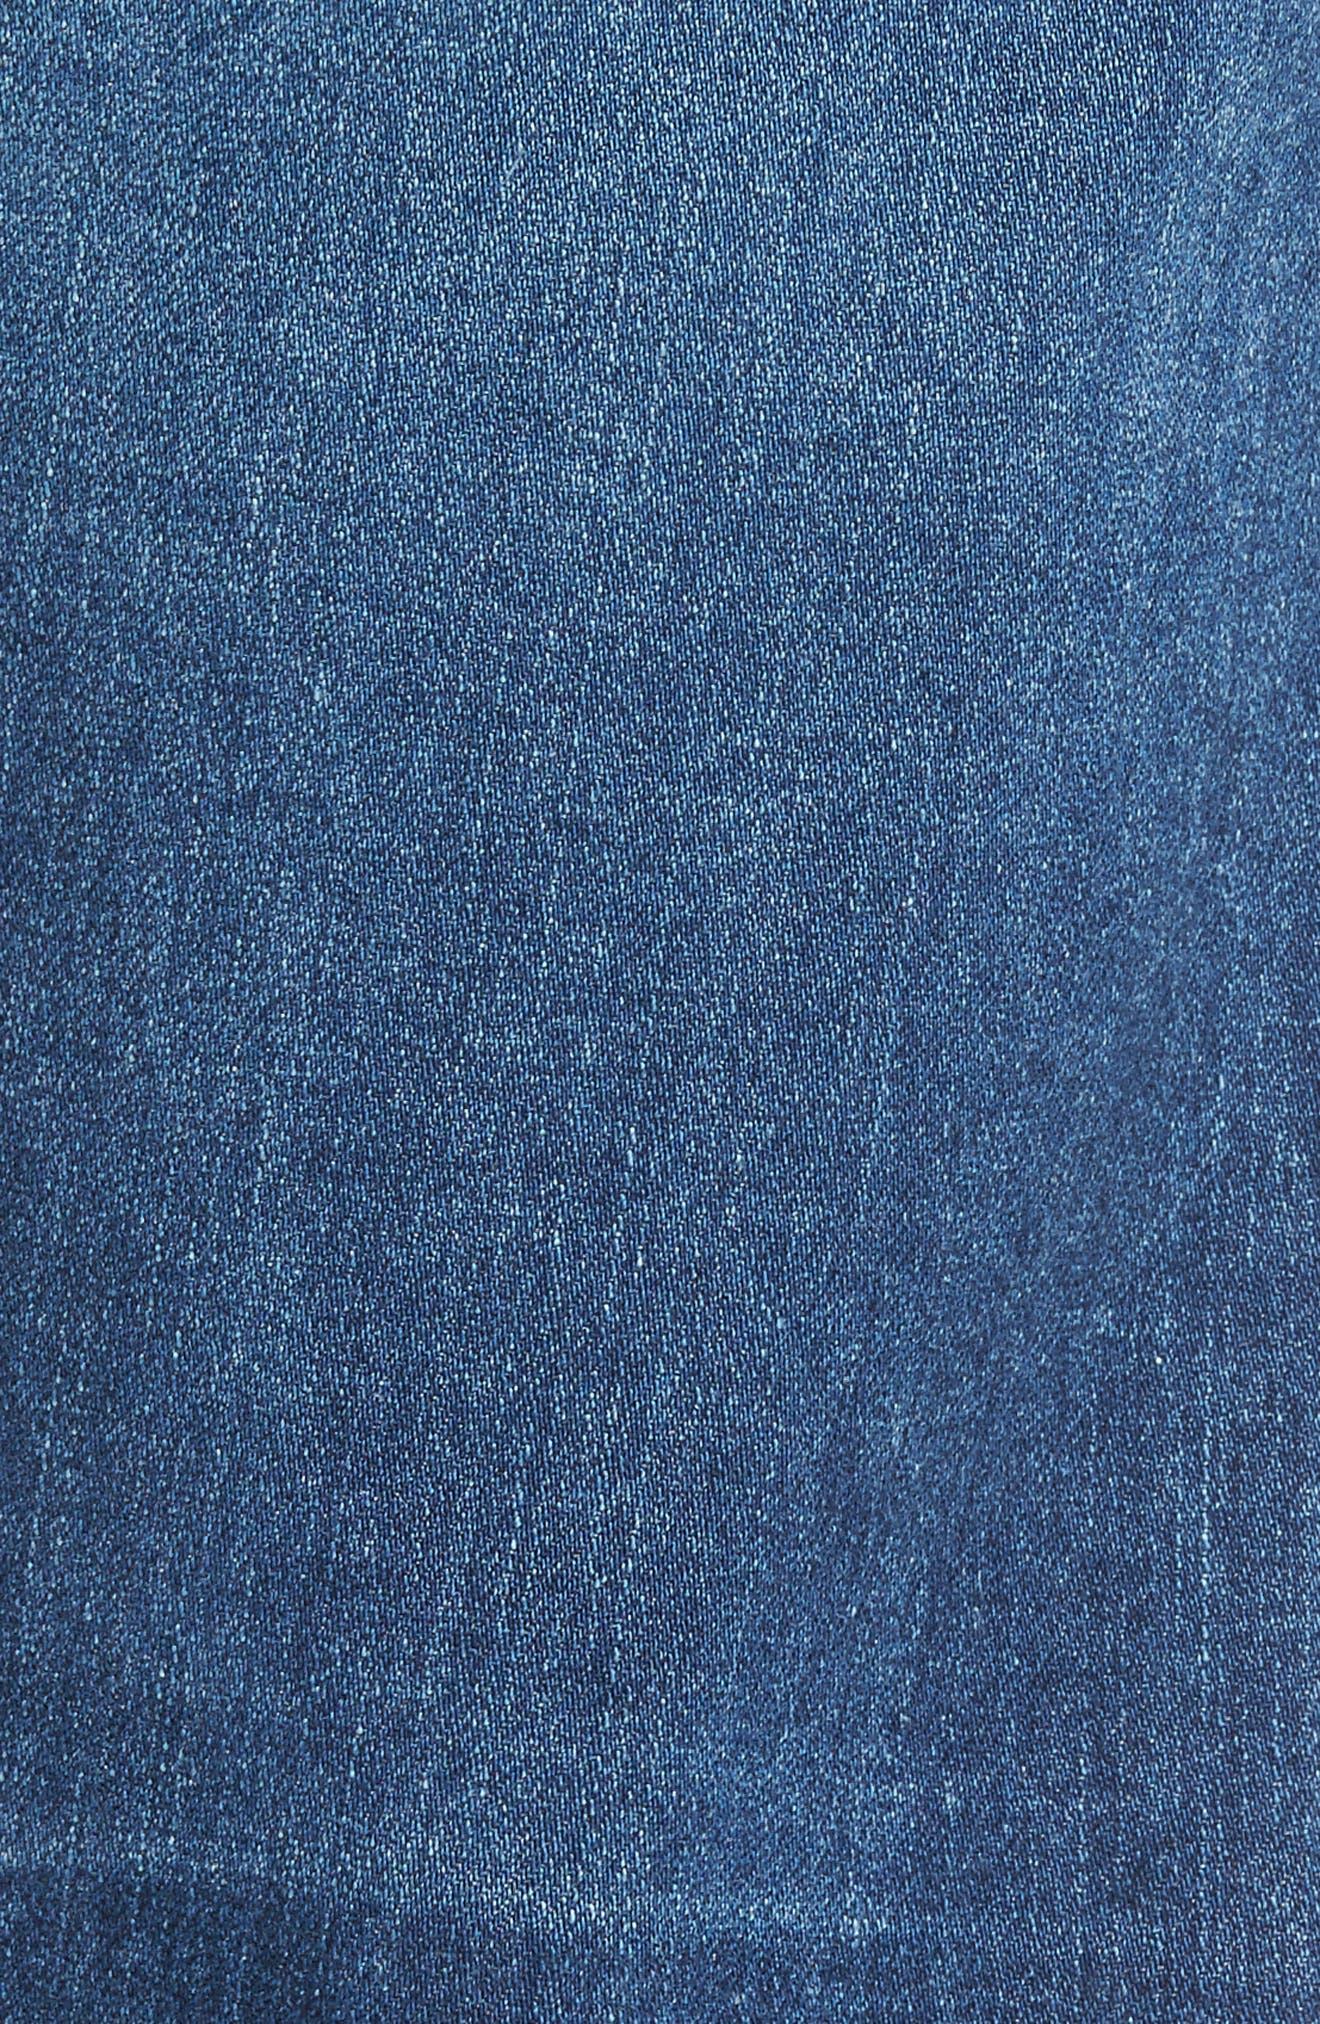 Graduate Slim Straight Leg Jeans,                             Alternate thumbnail 5, color,                             450